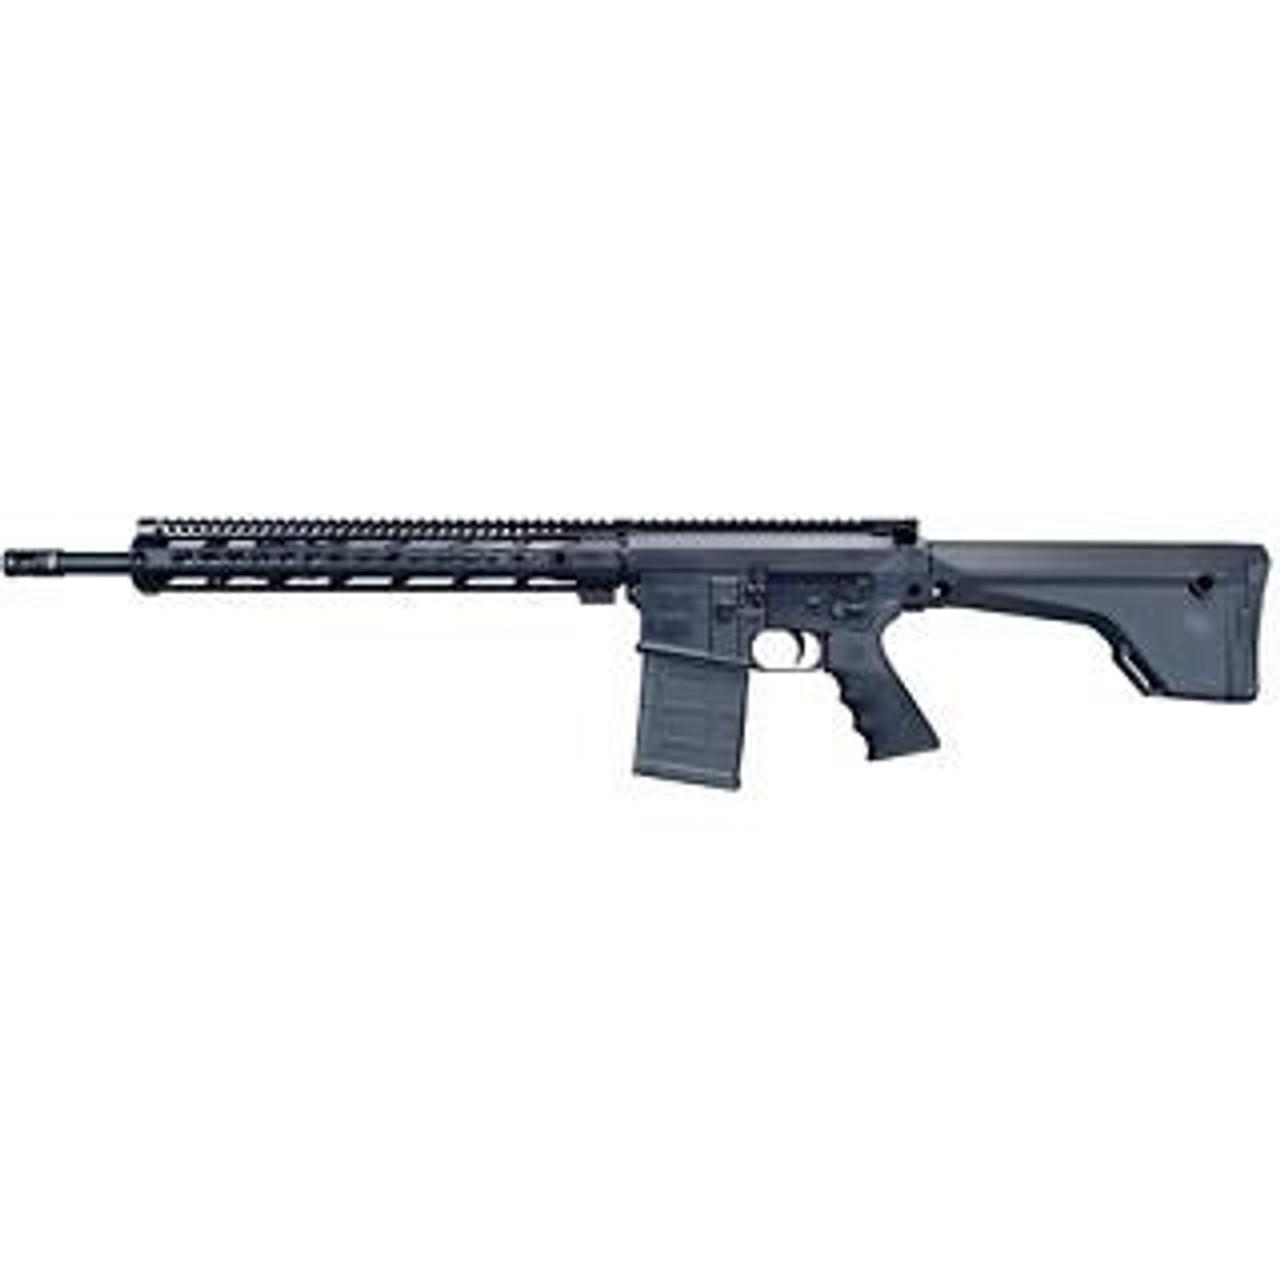 Windham Weaponry R18 FSFSM-CALIFORNIA LEGAL - .308/7.62x51